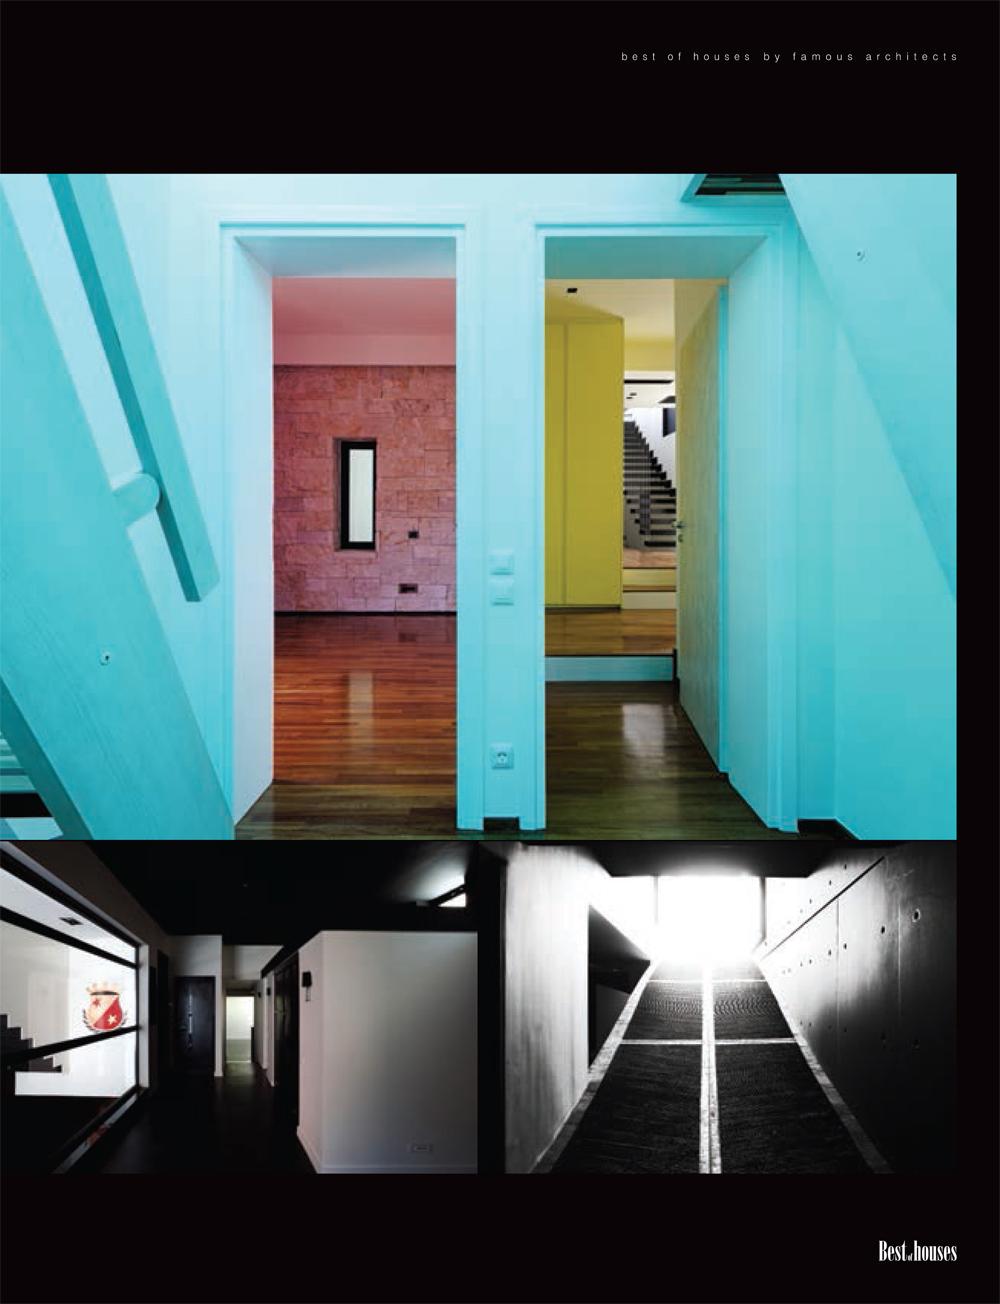 149_161_BoH_Dream_house-5.jpg